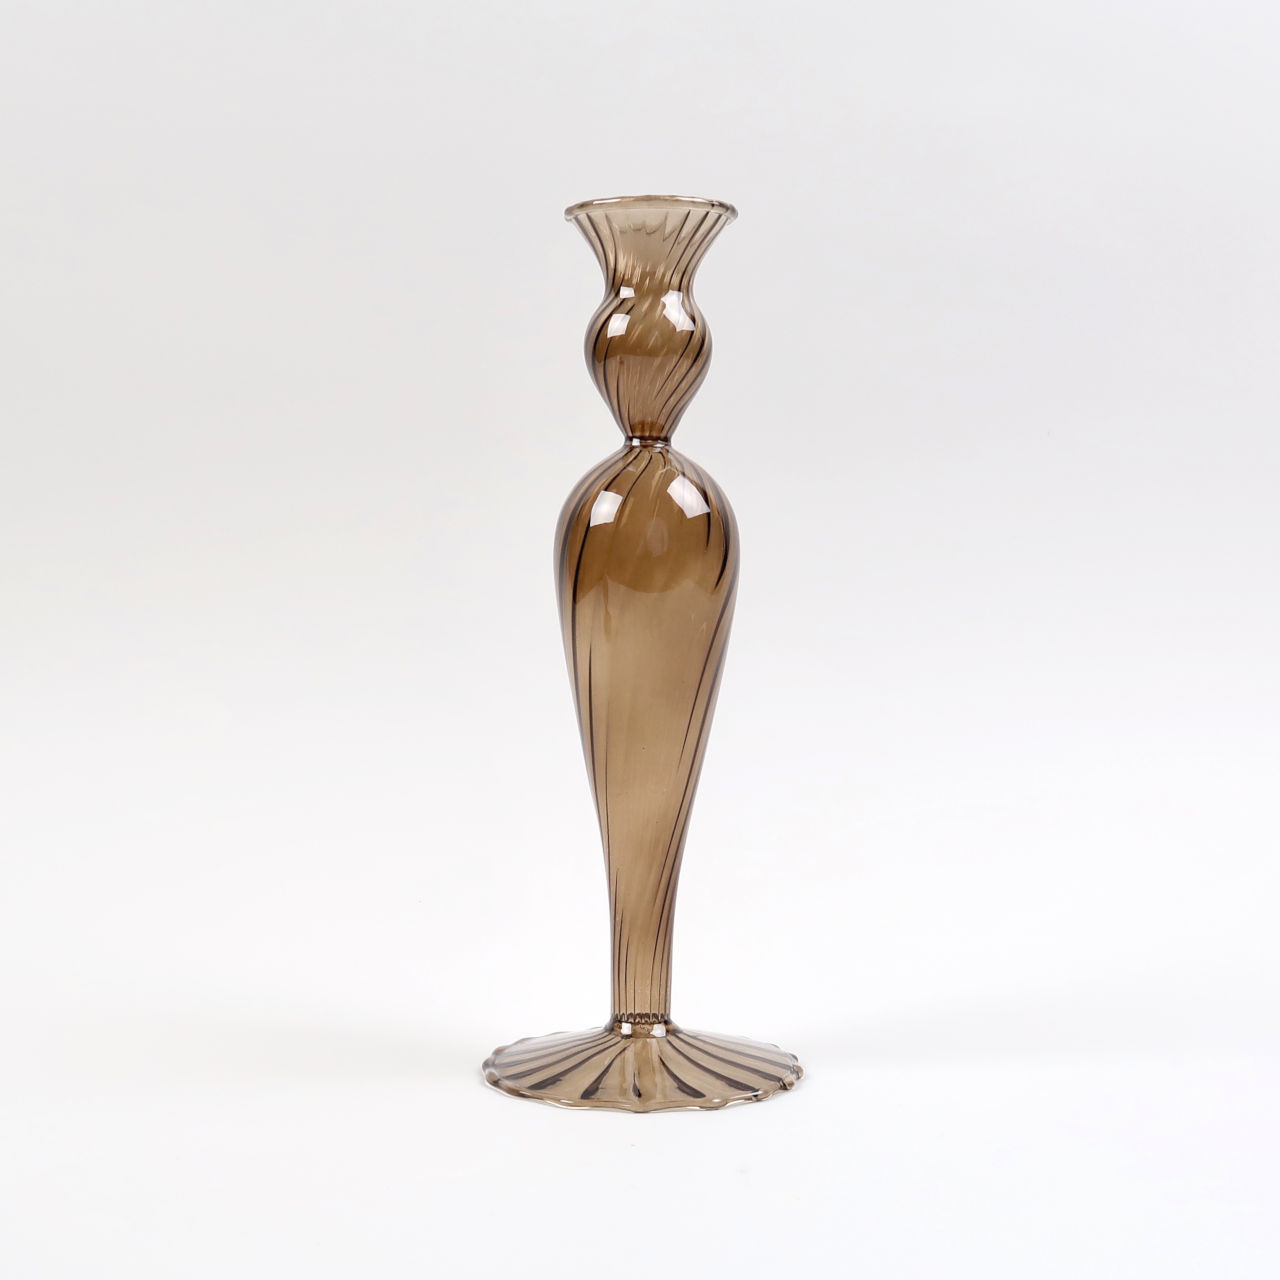 Venezian Glass Candle Holder - Design No. 2 - Amber